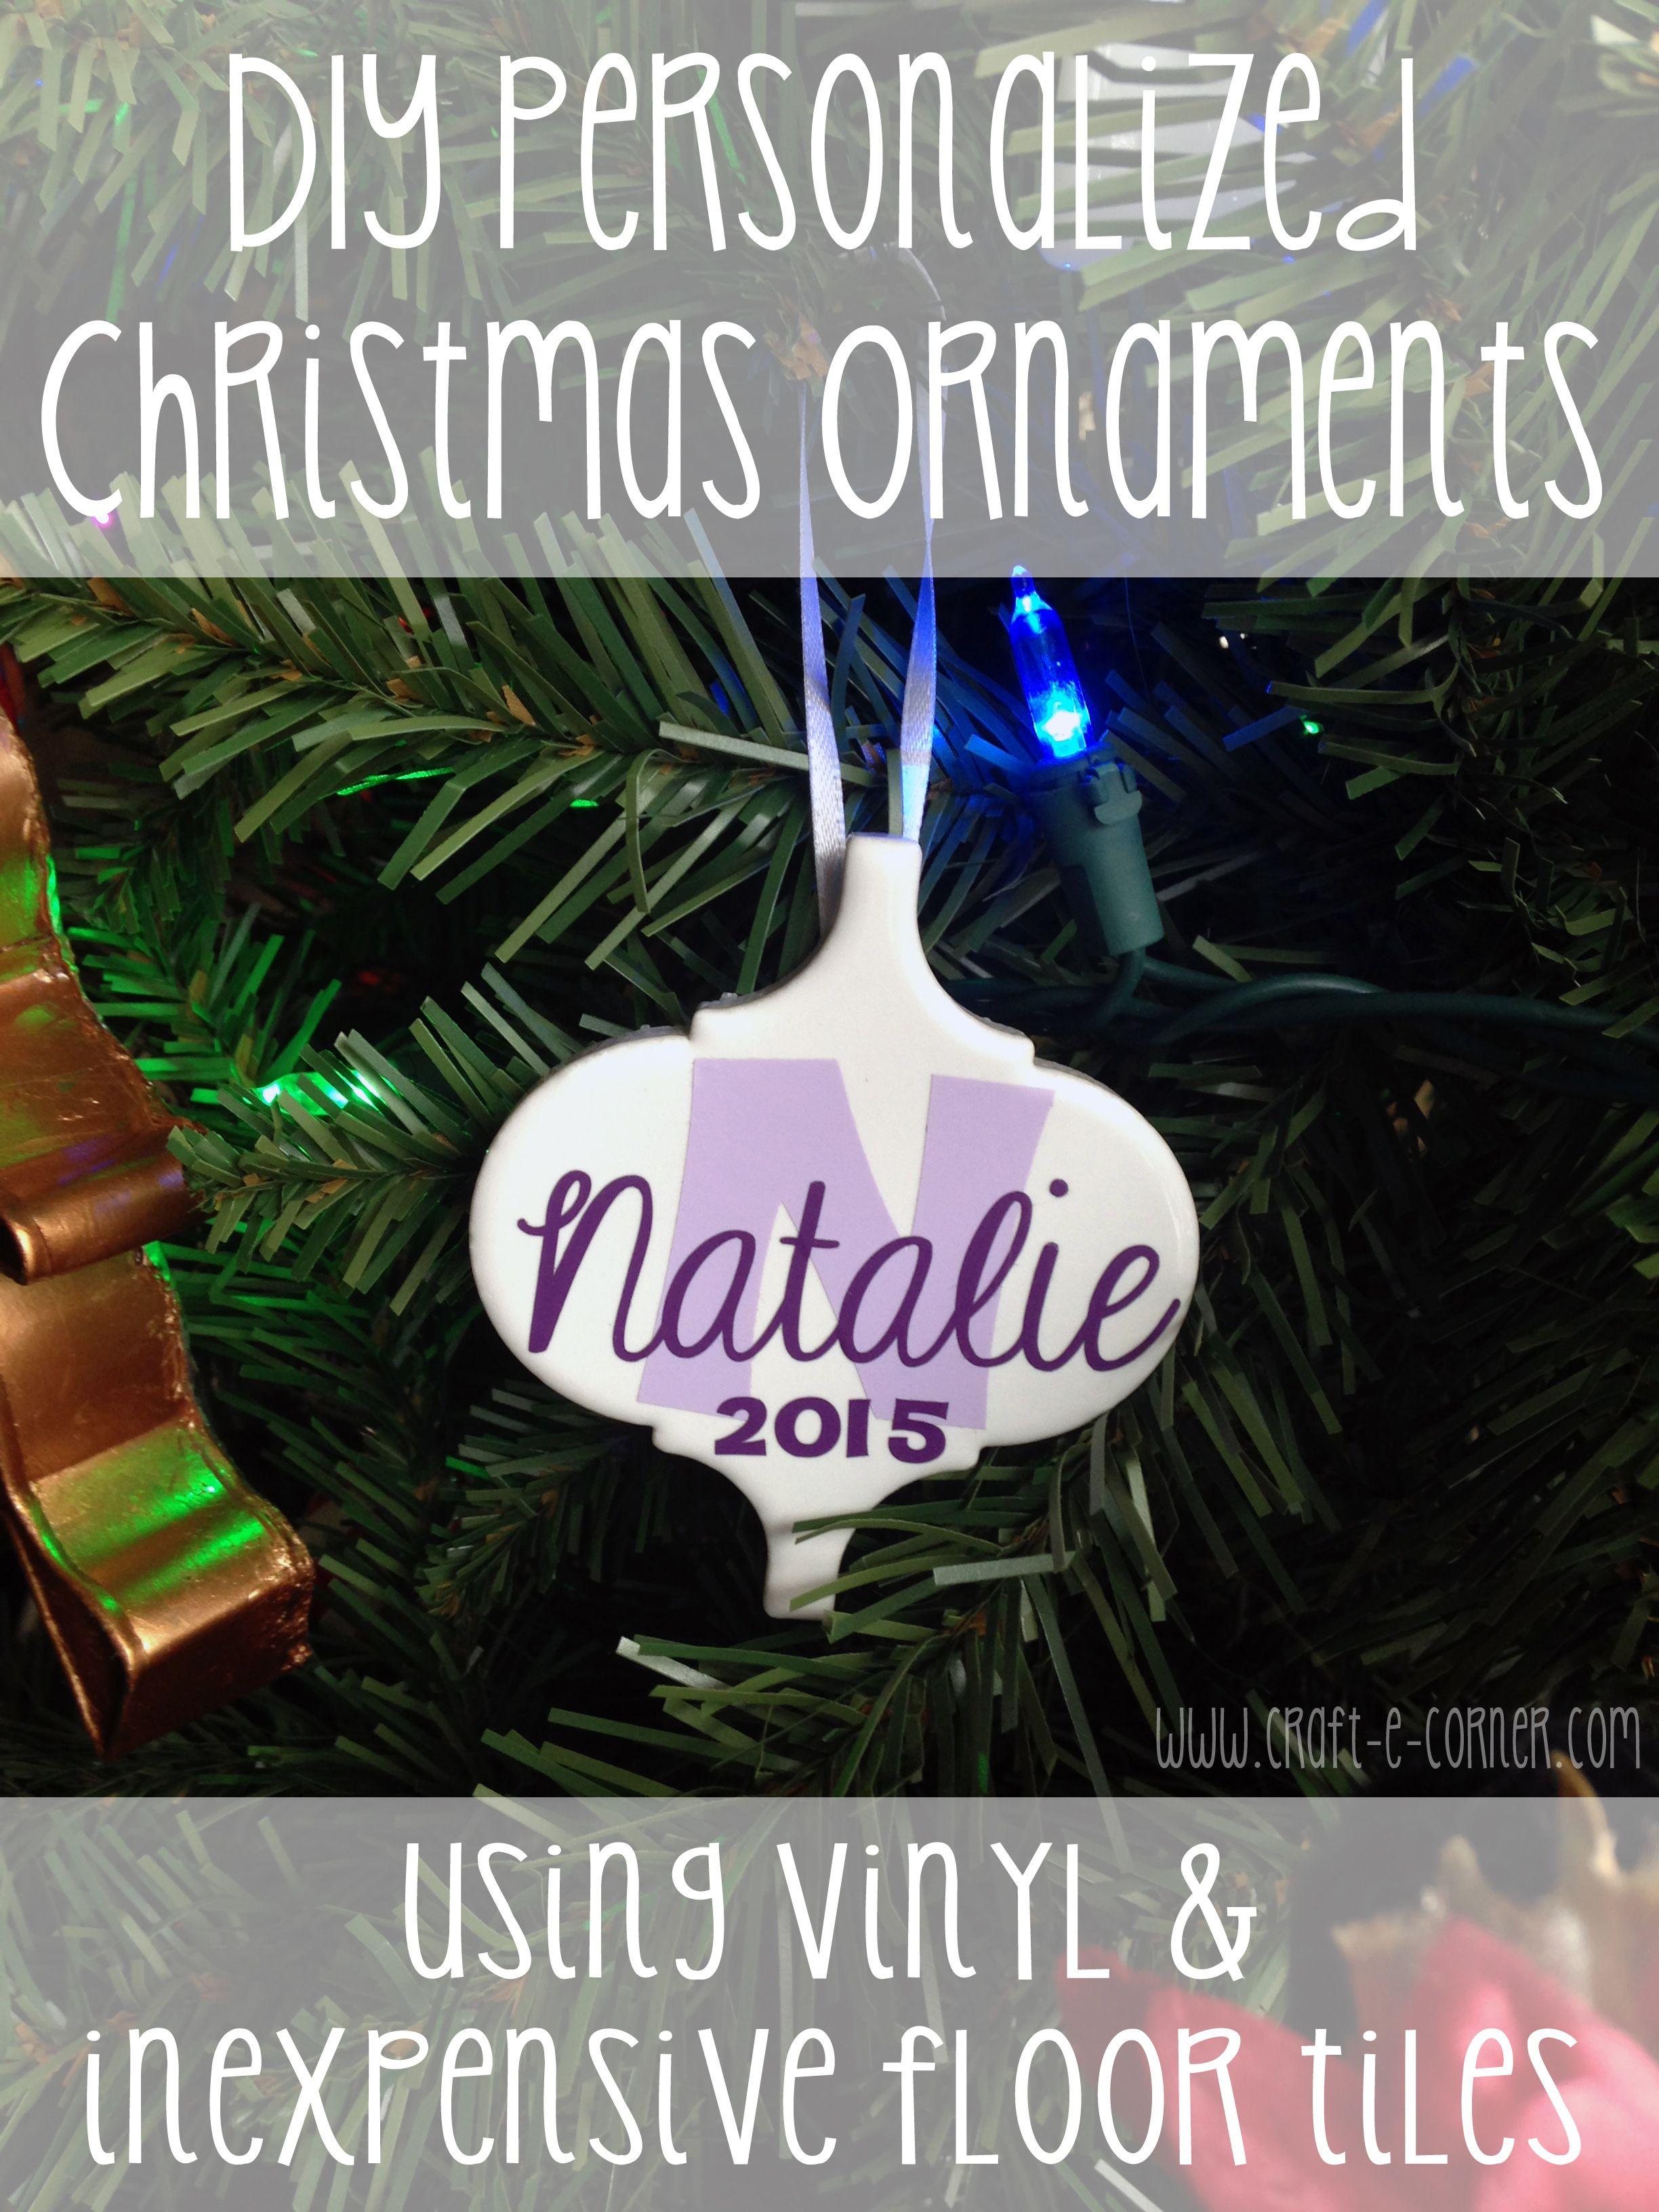 Diy Personalized Ceramic Tile Christmas Ornaments Craft E Corner Blog Christmas Ornament Crafts Christmas Ornaments Ornaments